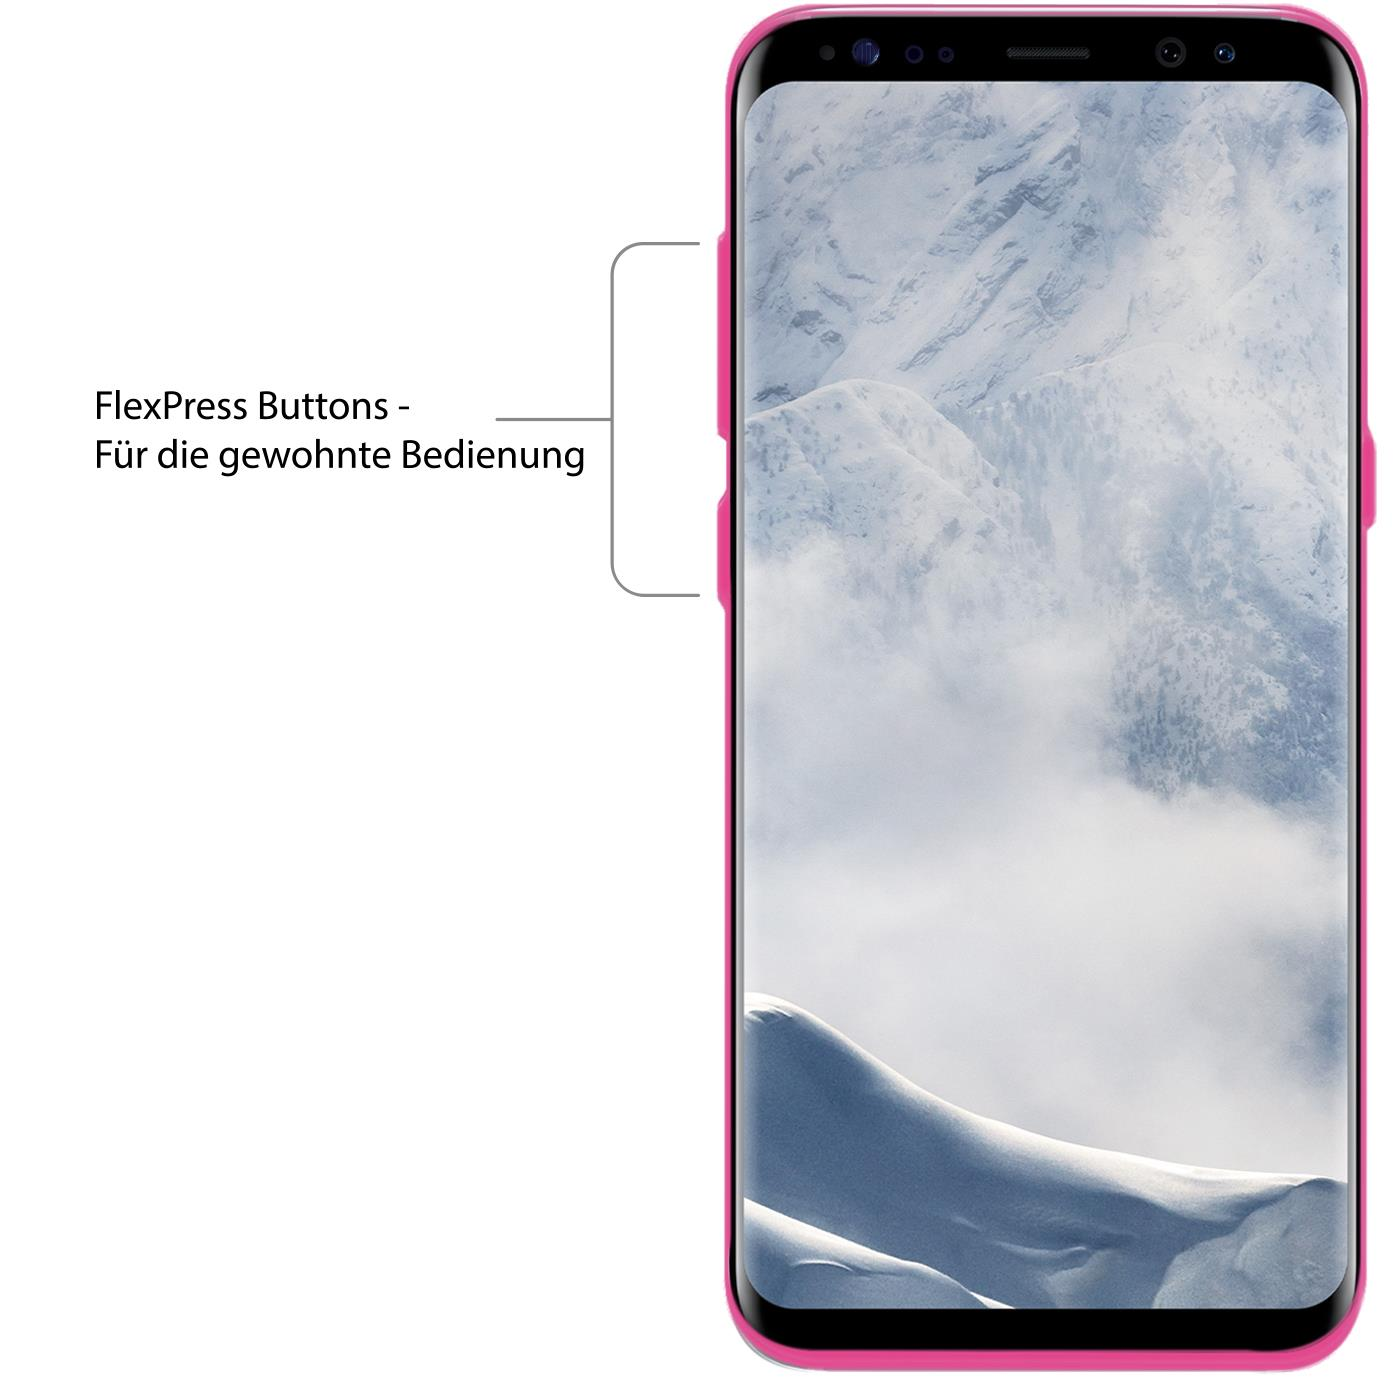 Samsung-Galaxy-s8-Duenn-Silikon-Klar-Case-Cover-Ultra-Slim-Stossfeste-Gel-Rueckseite Indexbild 26